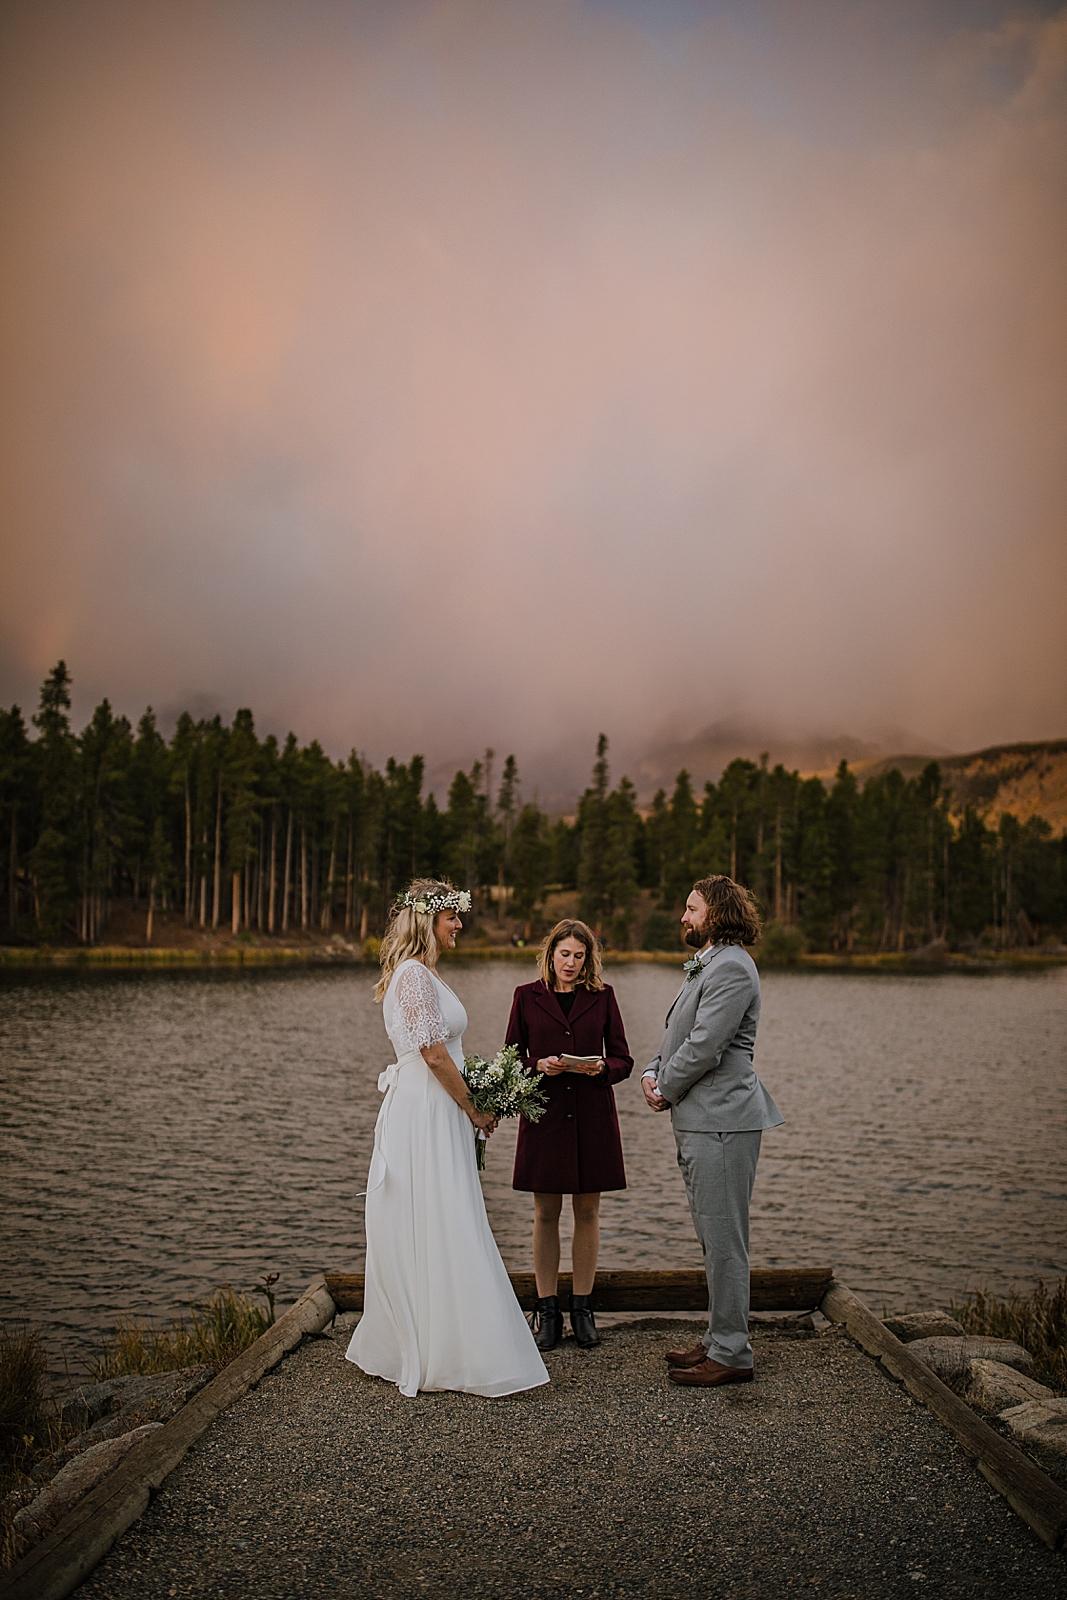 sprague lake dock elopement ceremony, sunrise elopement, colorado elopement, sprague lake elopement, sprague lake wedding, rocky mountain national park elopement, adventurous colorado hiking elopement